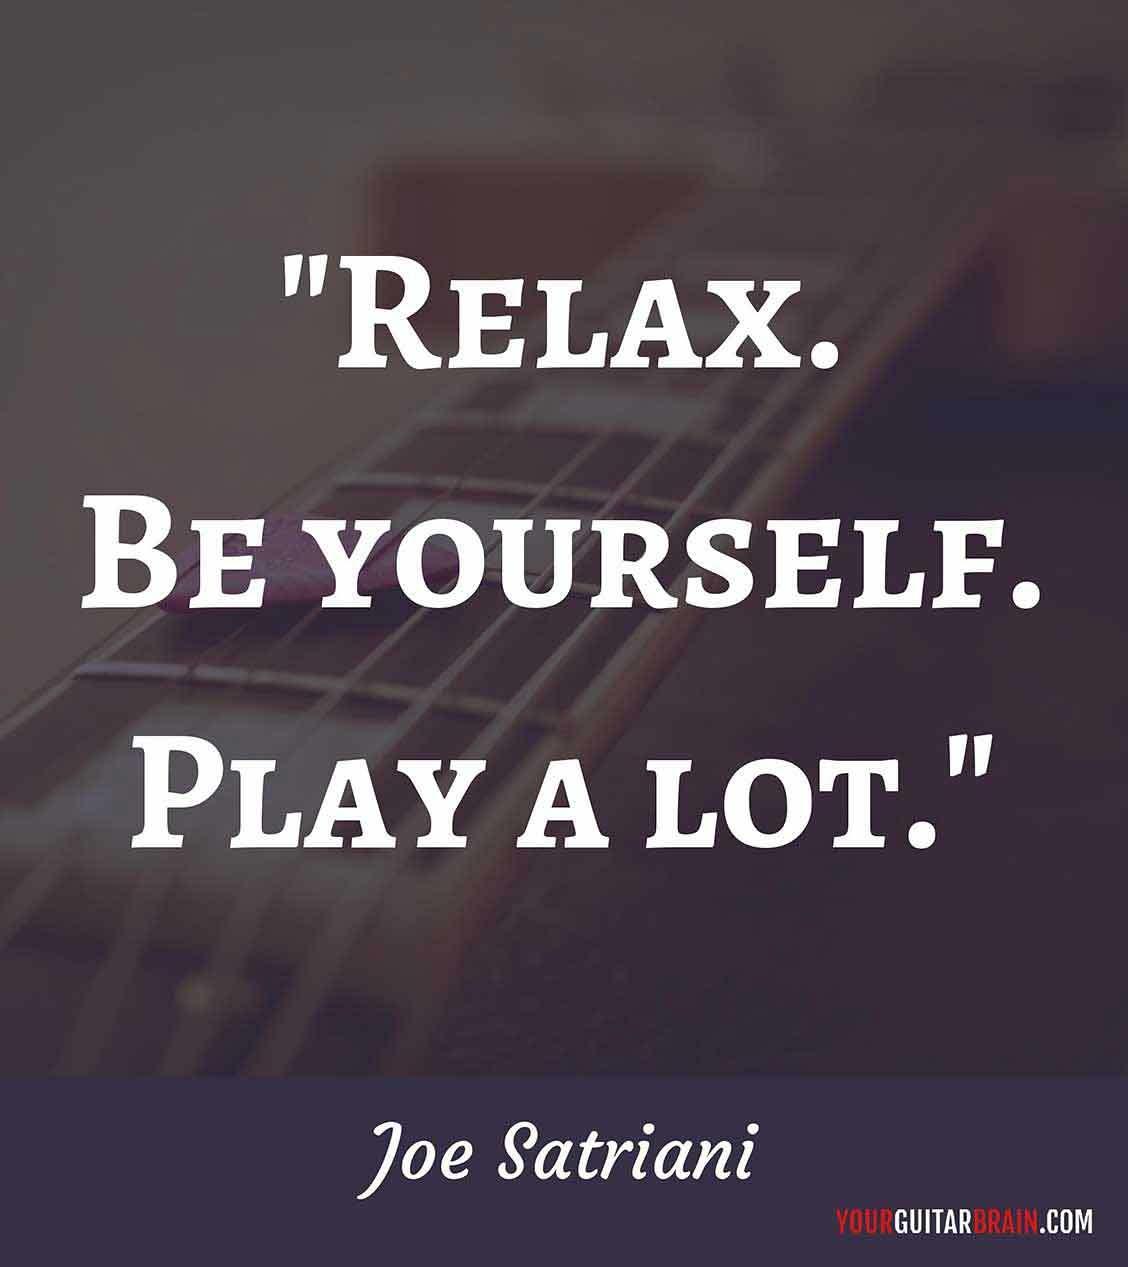 steve vair guitarist motivational inspiring quote about life